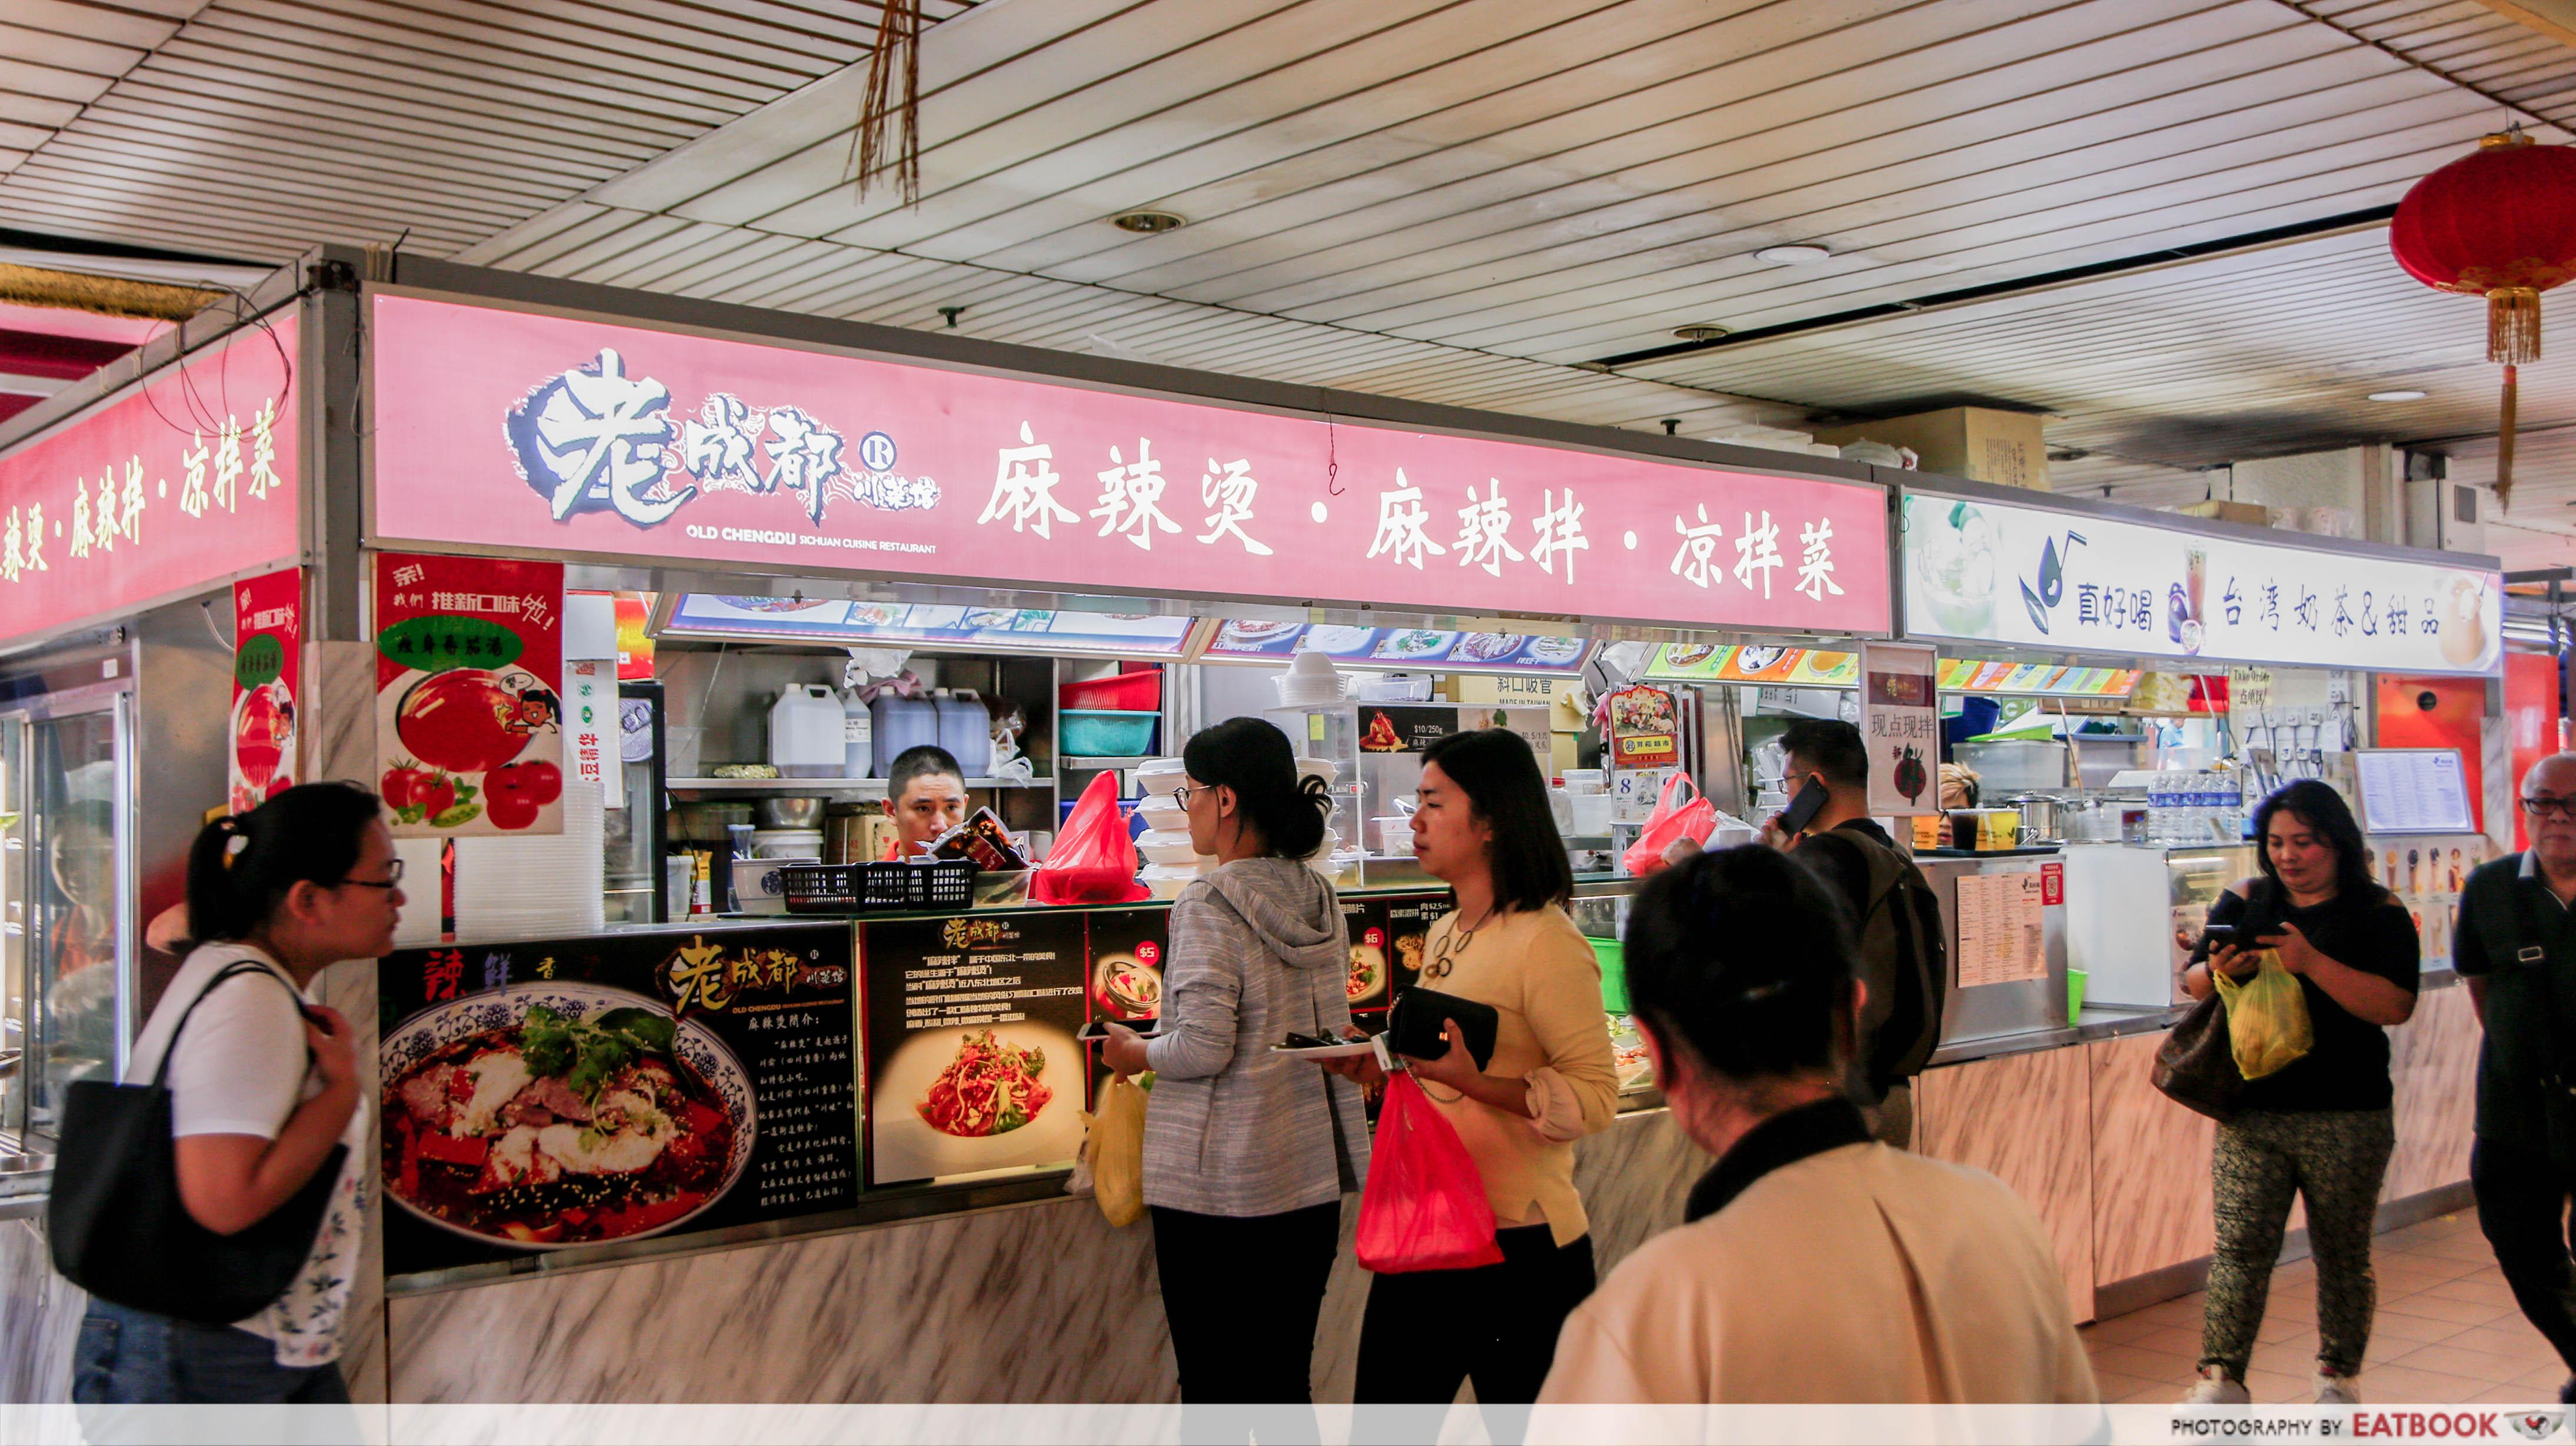 old chengdu - shopfront